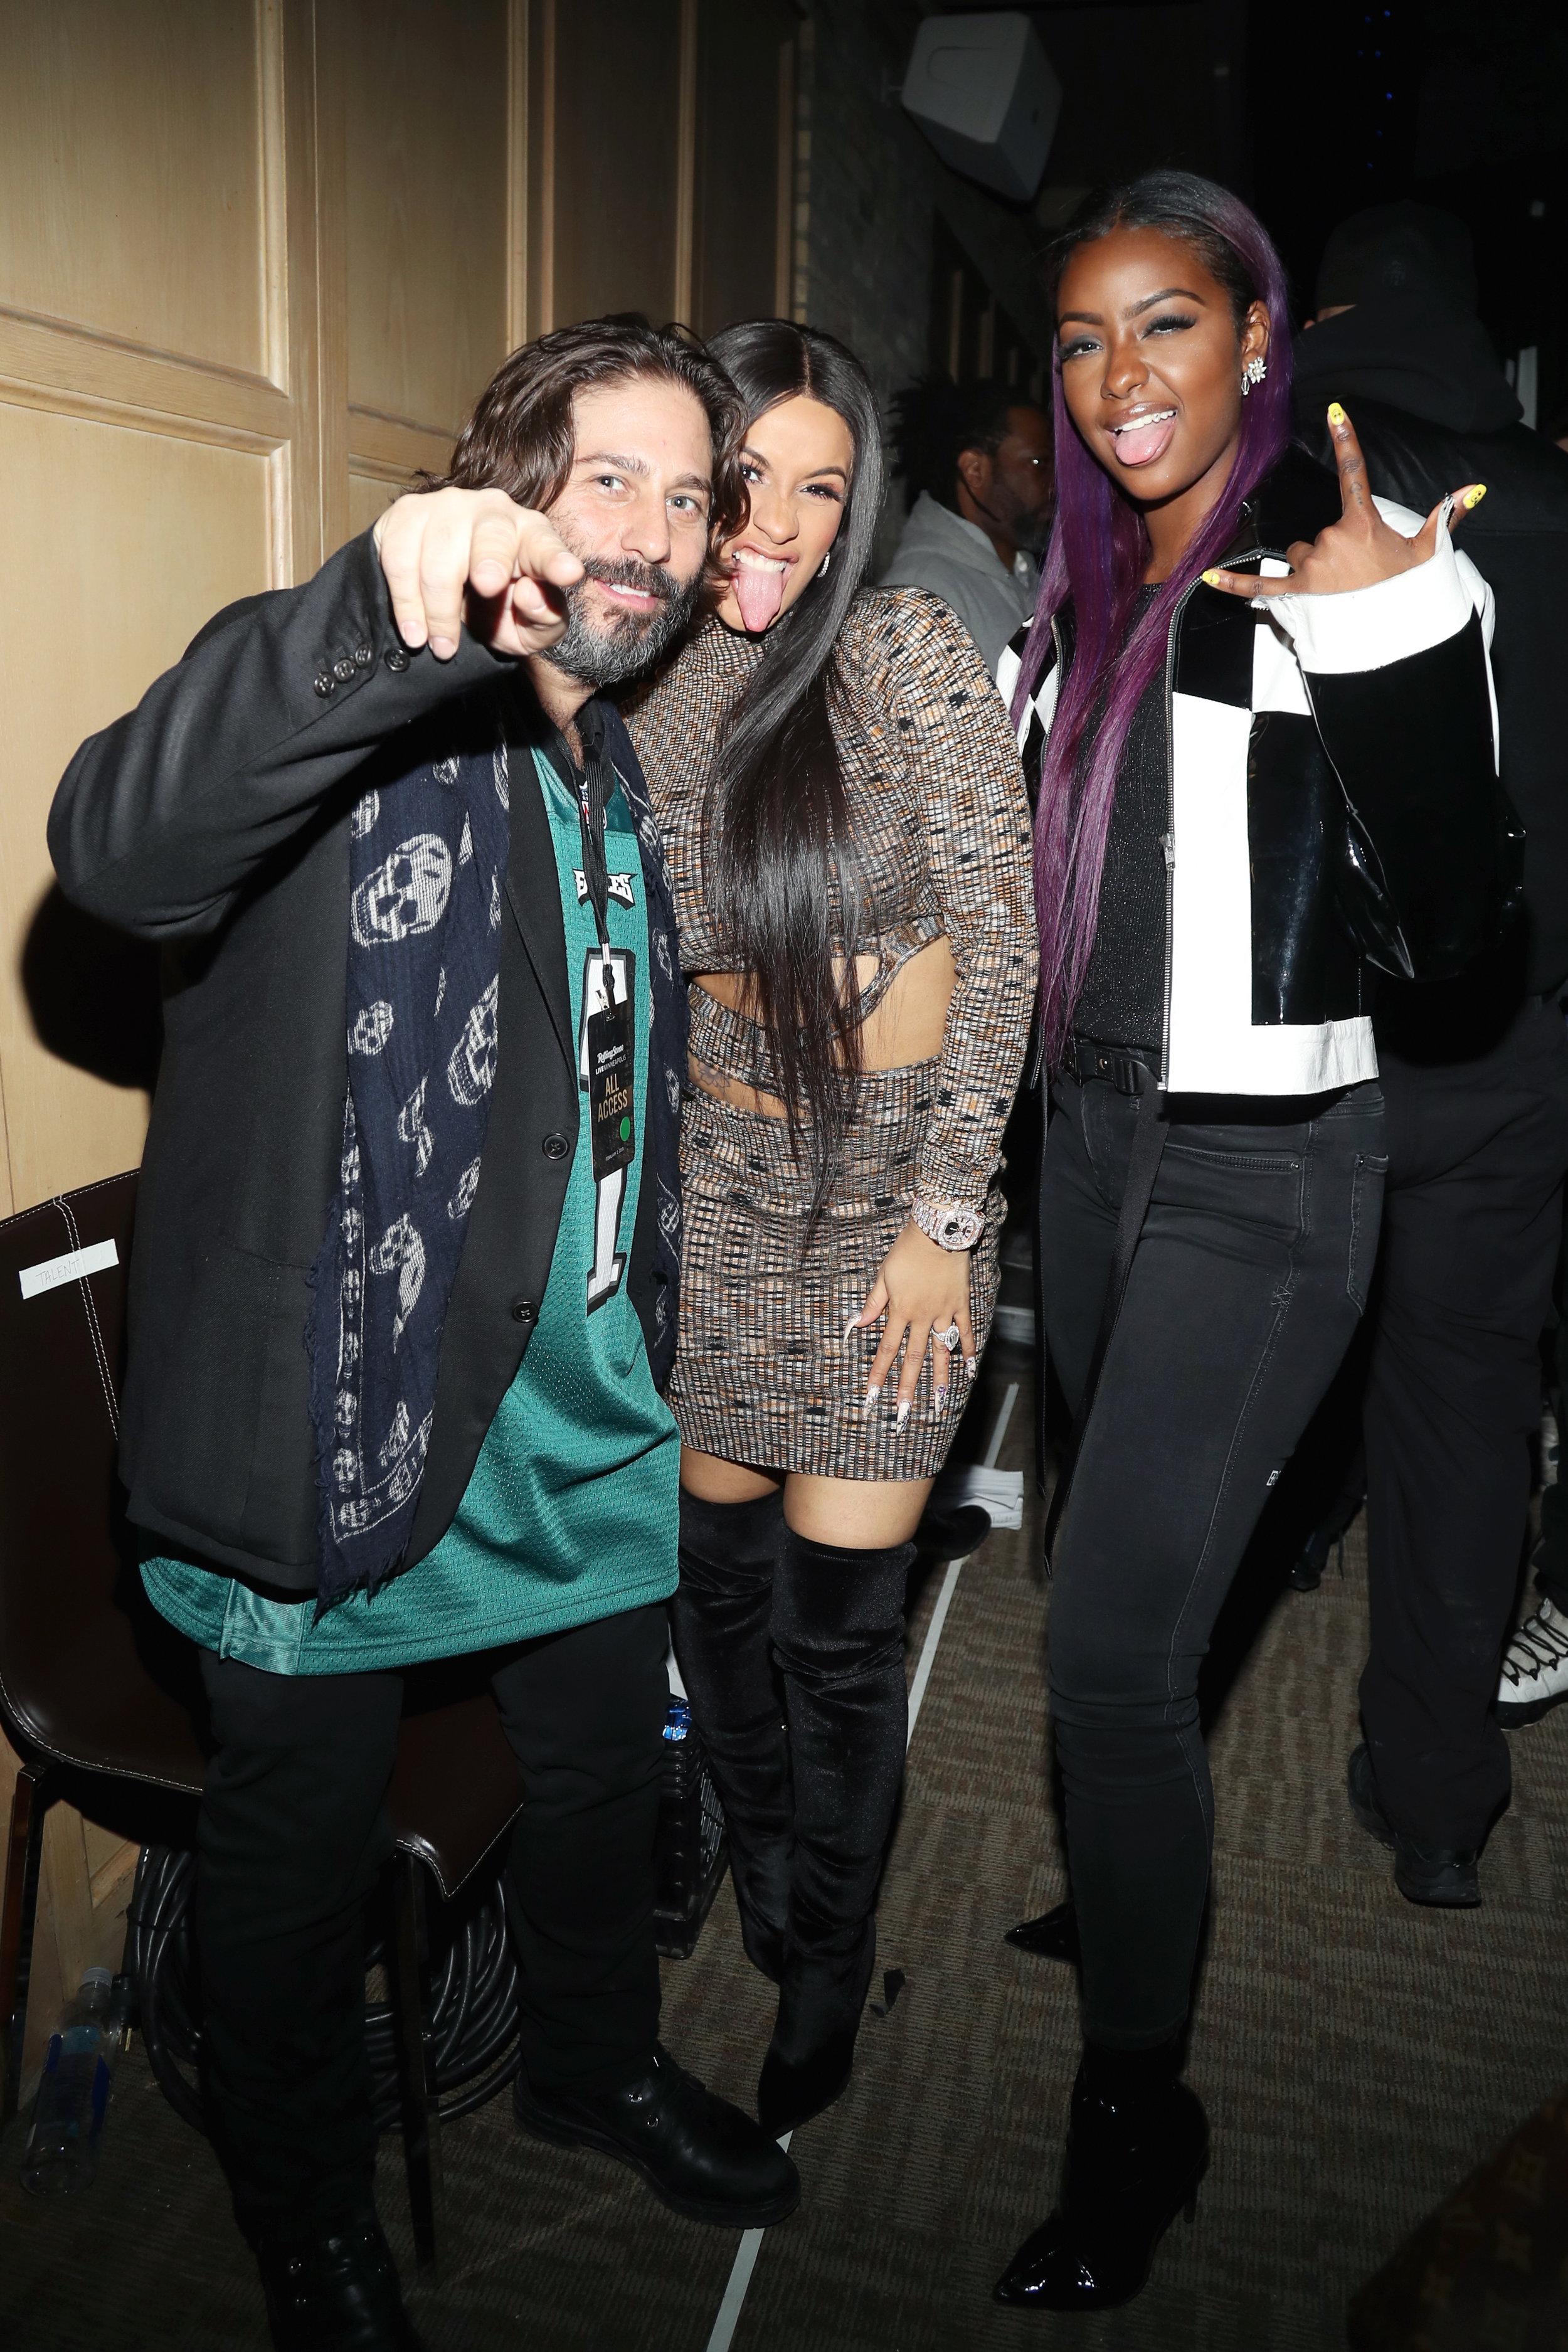 Michael Heller, Cardi B and Justine Skye